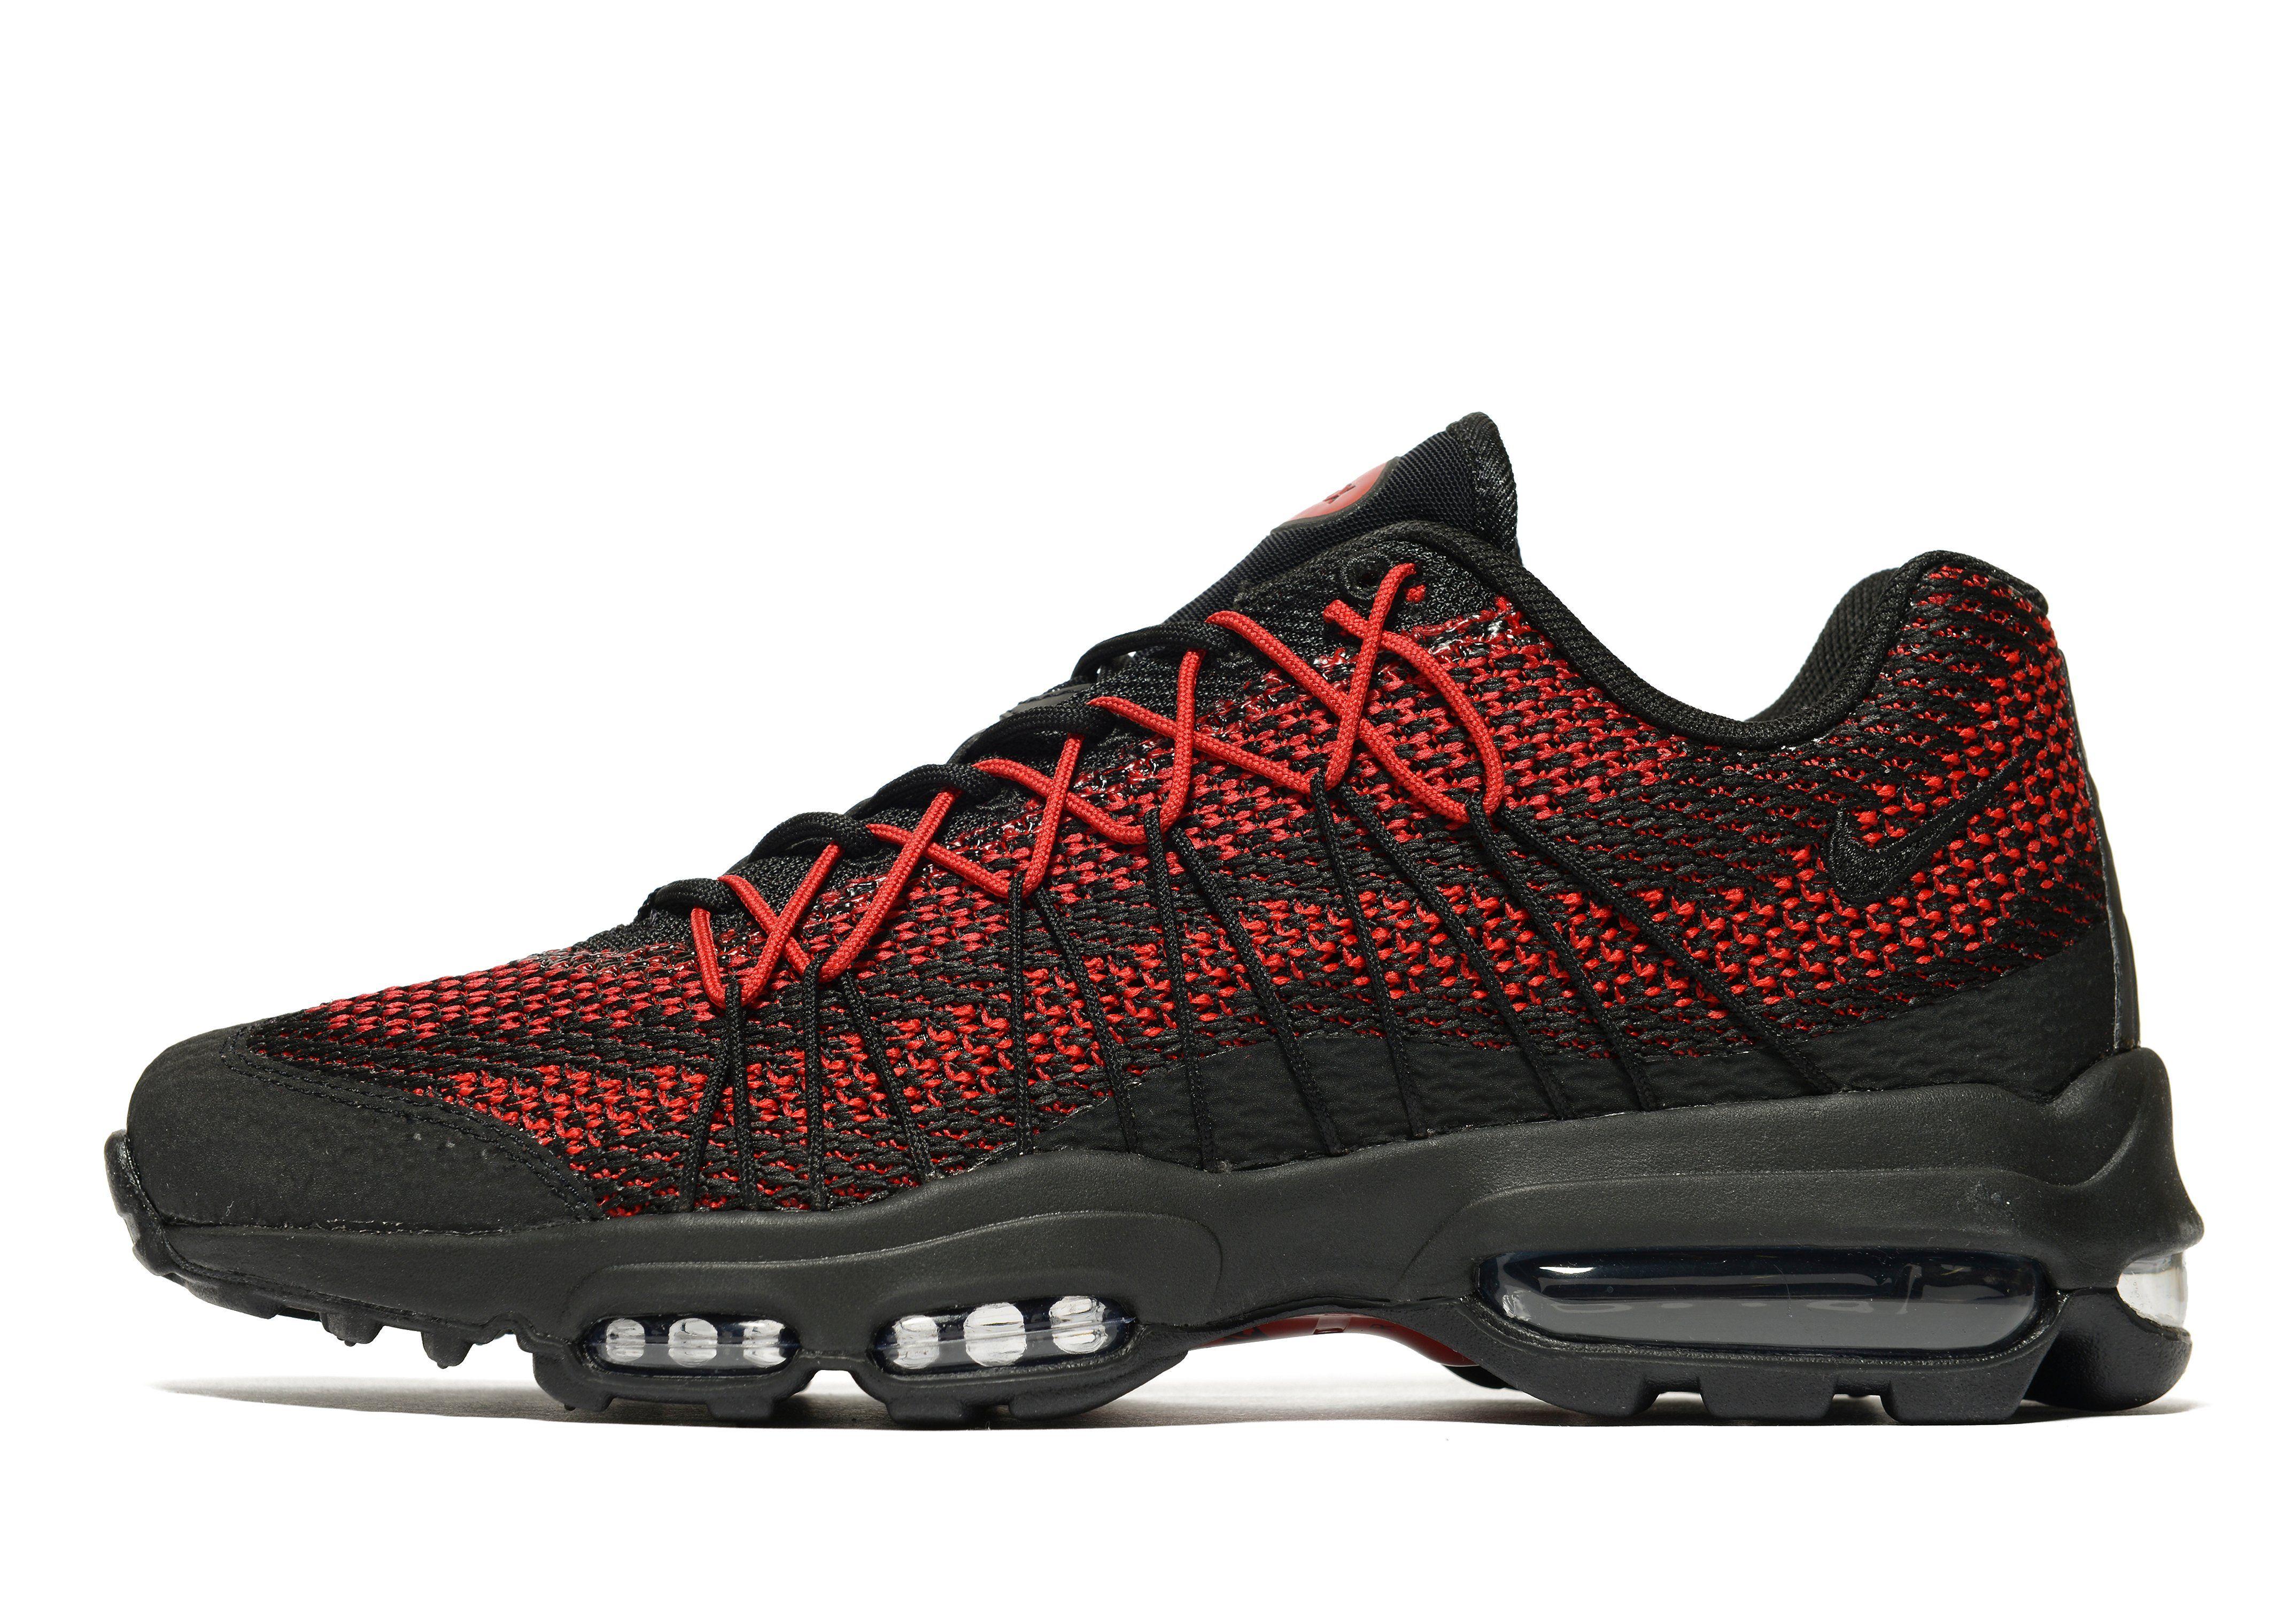 Nike air max 95 £130 @ JD Sports